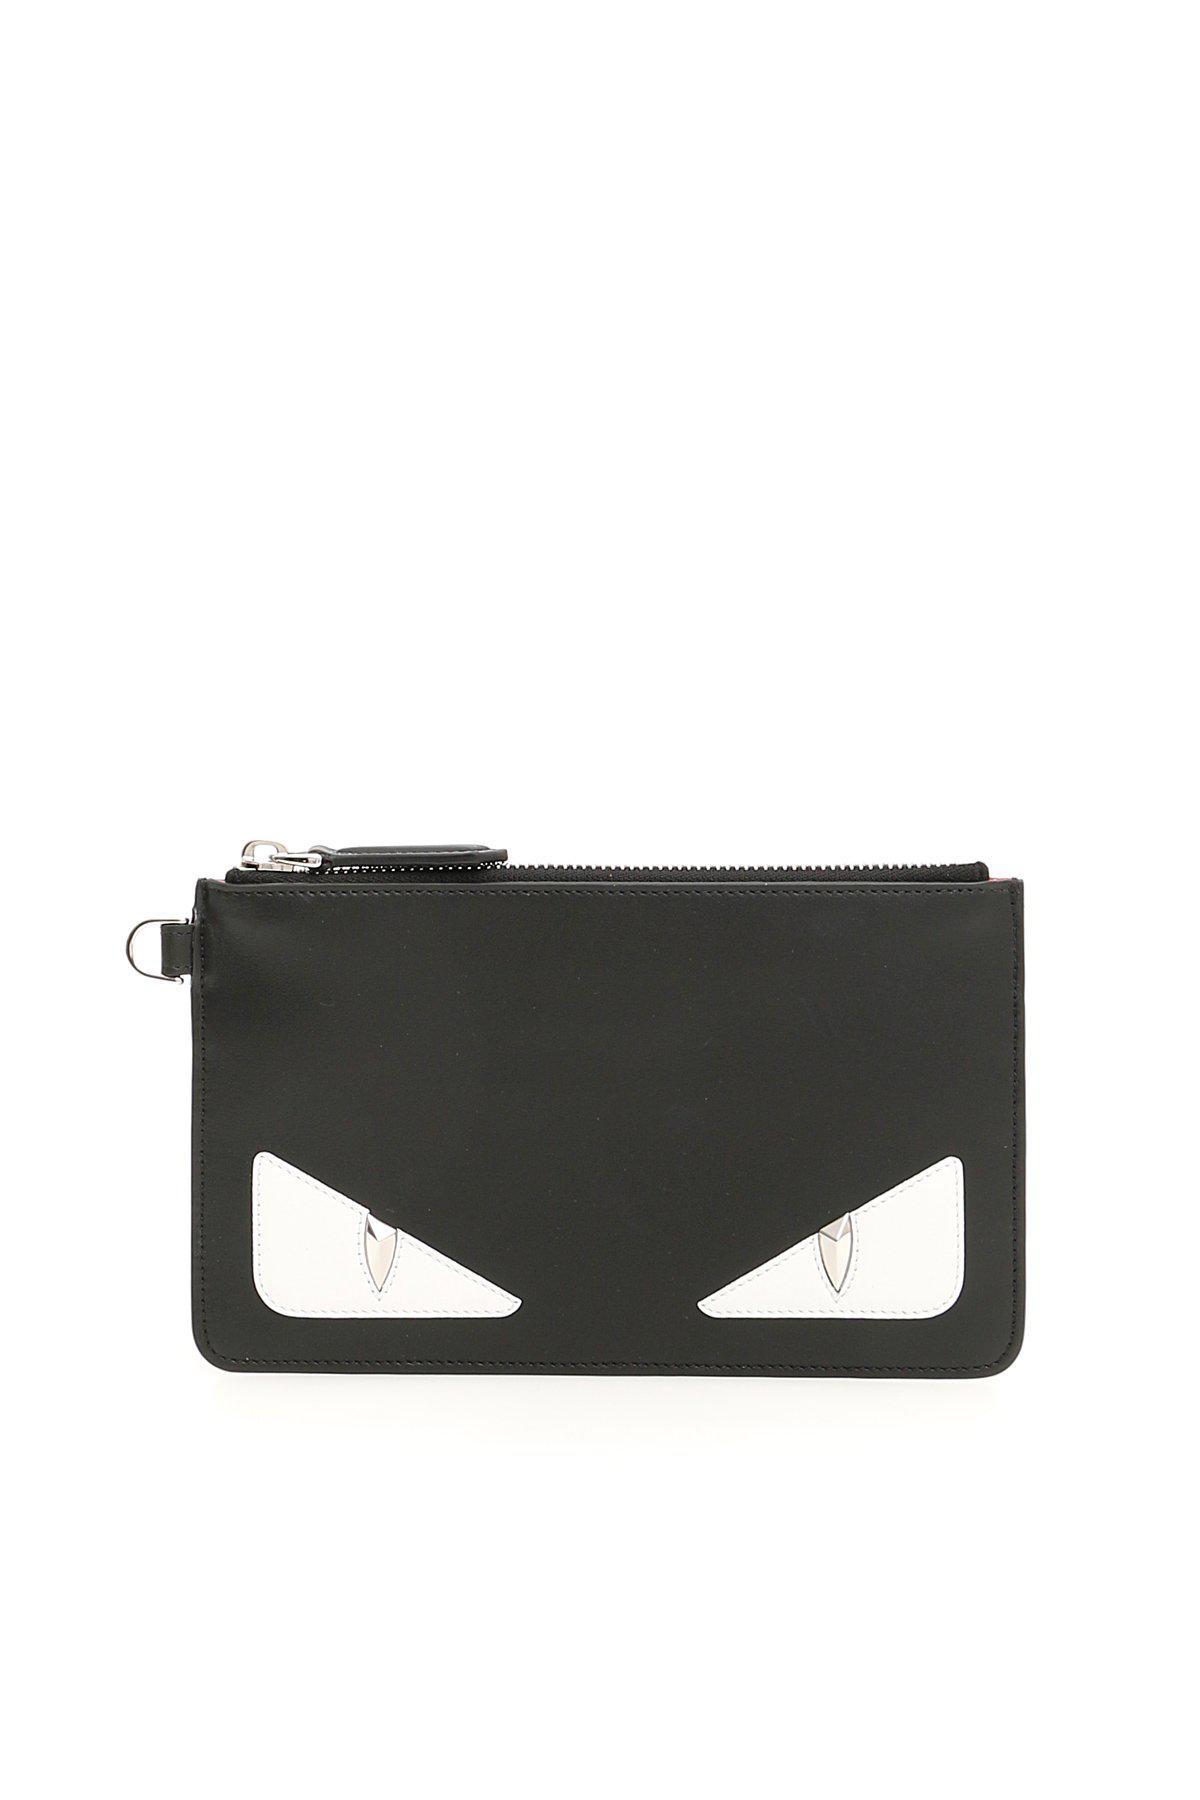 Lyst - Fendi Bag Bugs Top Zip Pouch in Black 981e3b0e19792